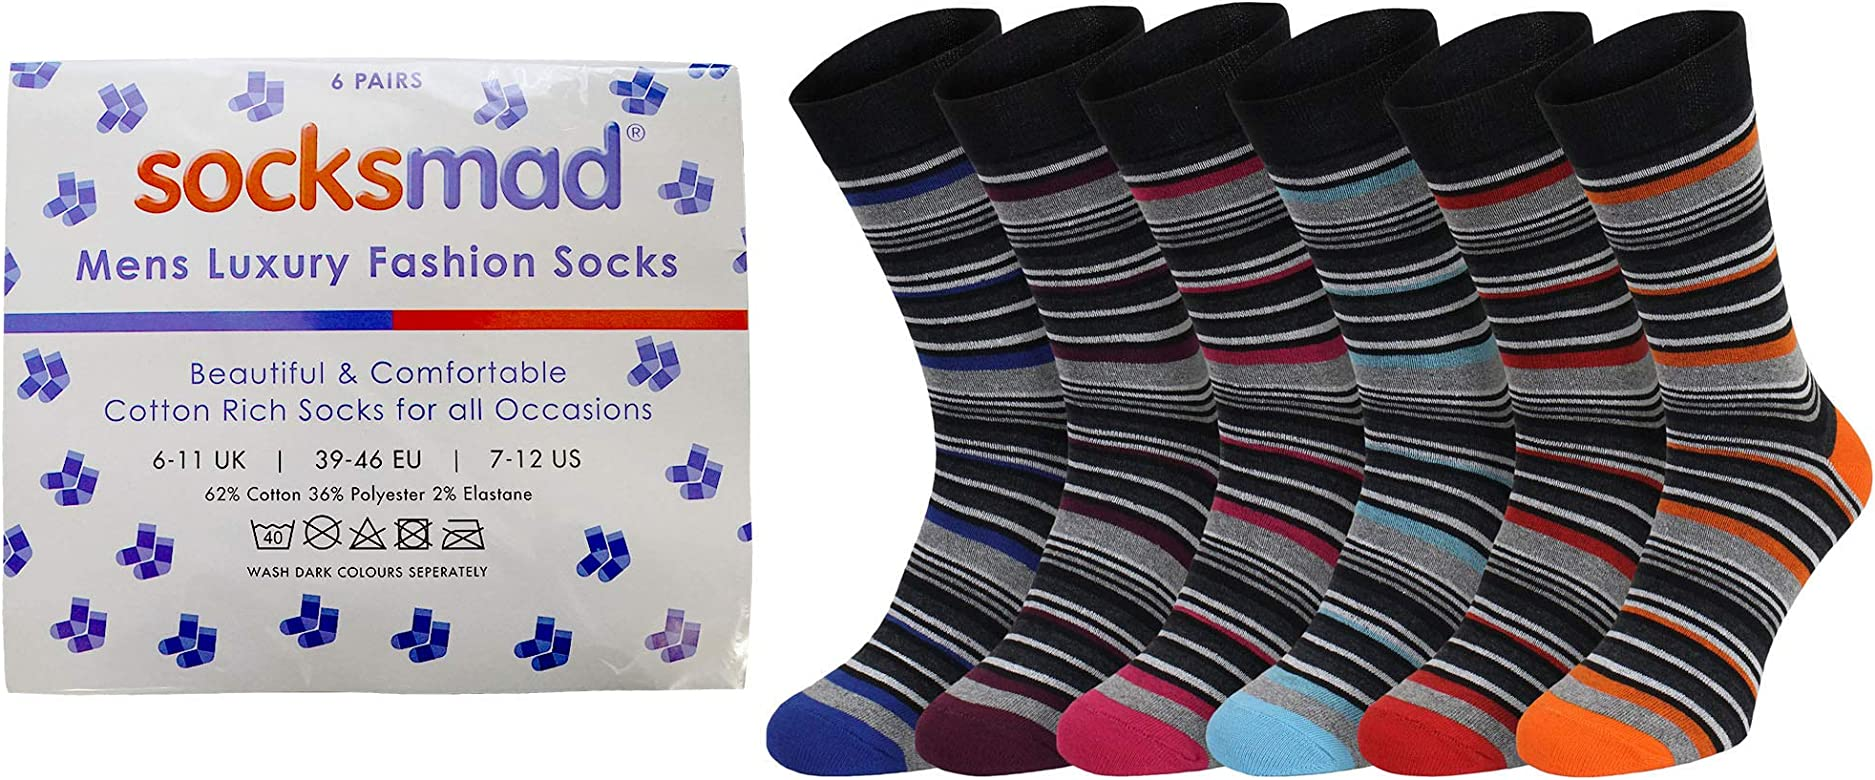 NEW 5 pairs Mens COTTON RICH Sports Socks Black with Elastane size 6-11 EU 39-46